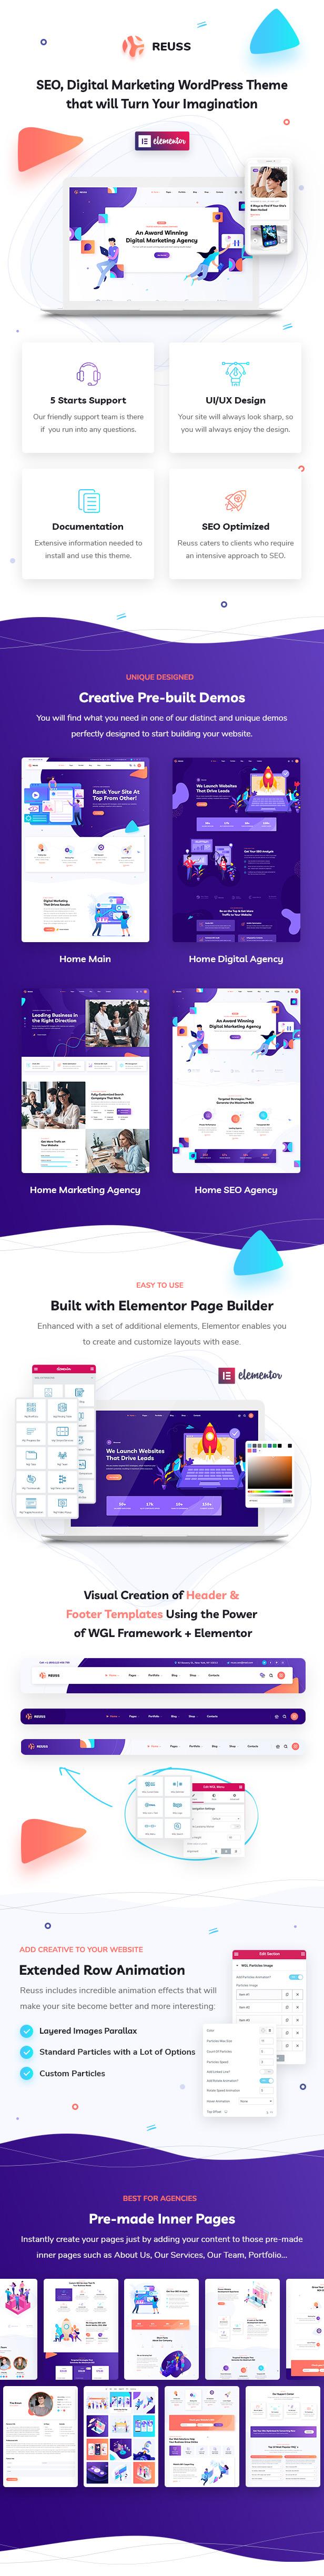 Reuss - SEO Marketing Agency WordPress Theme - 1